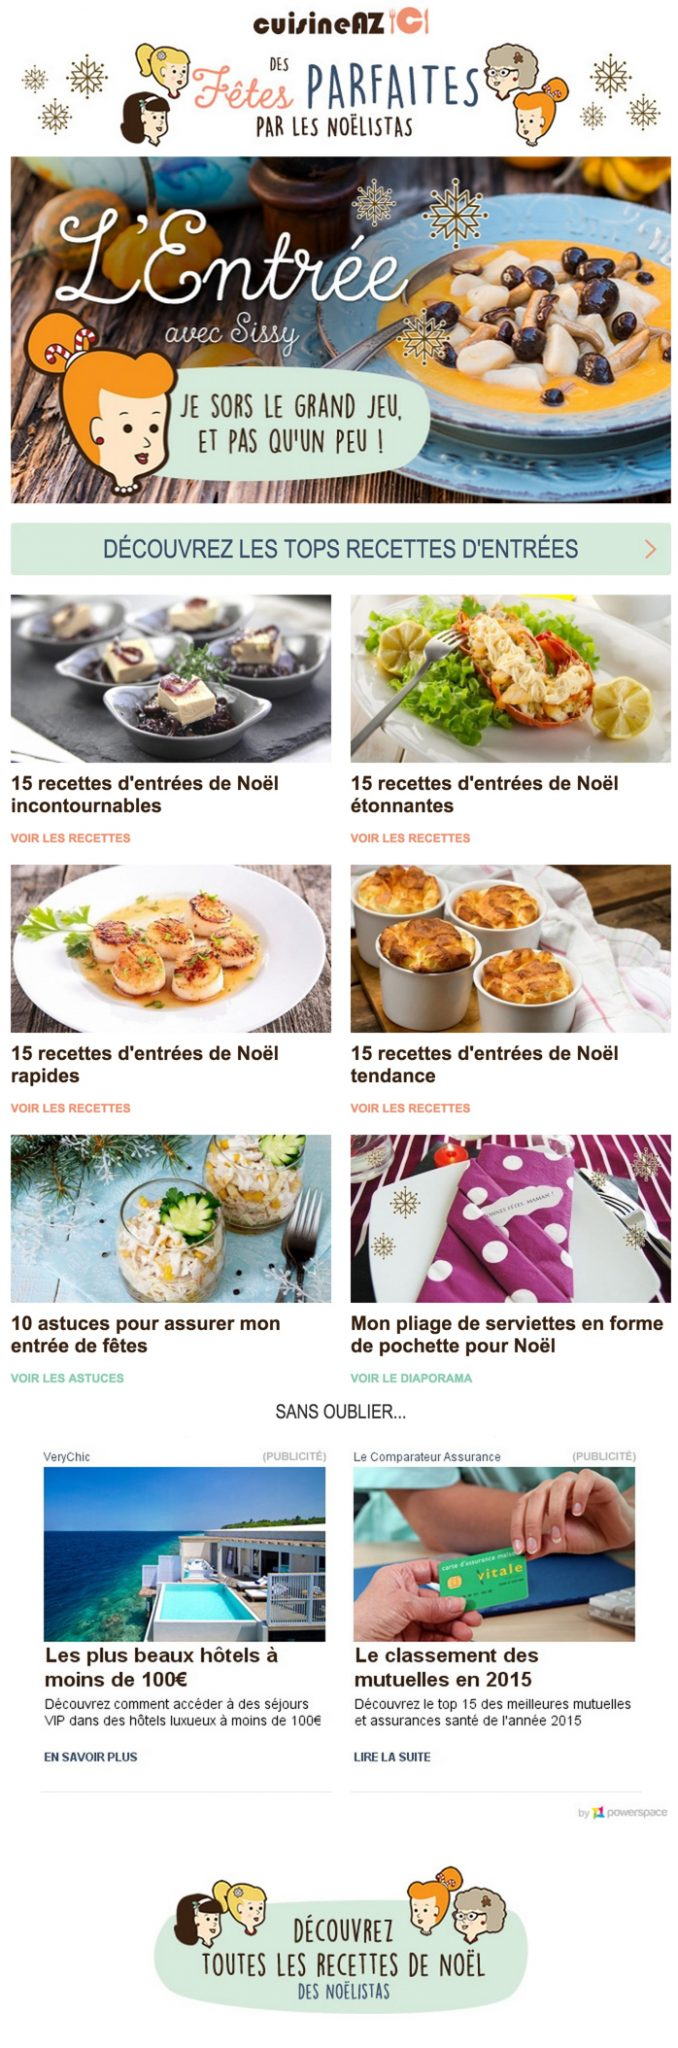 newsletter cuisine az du 18 novembre 2015